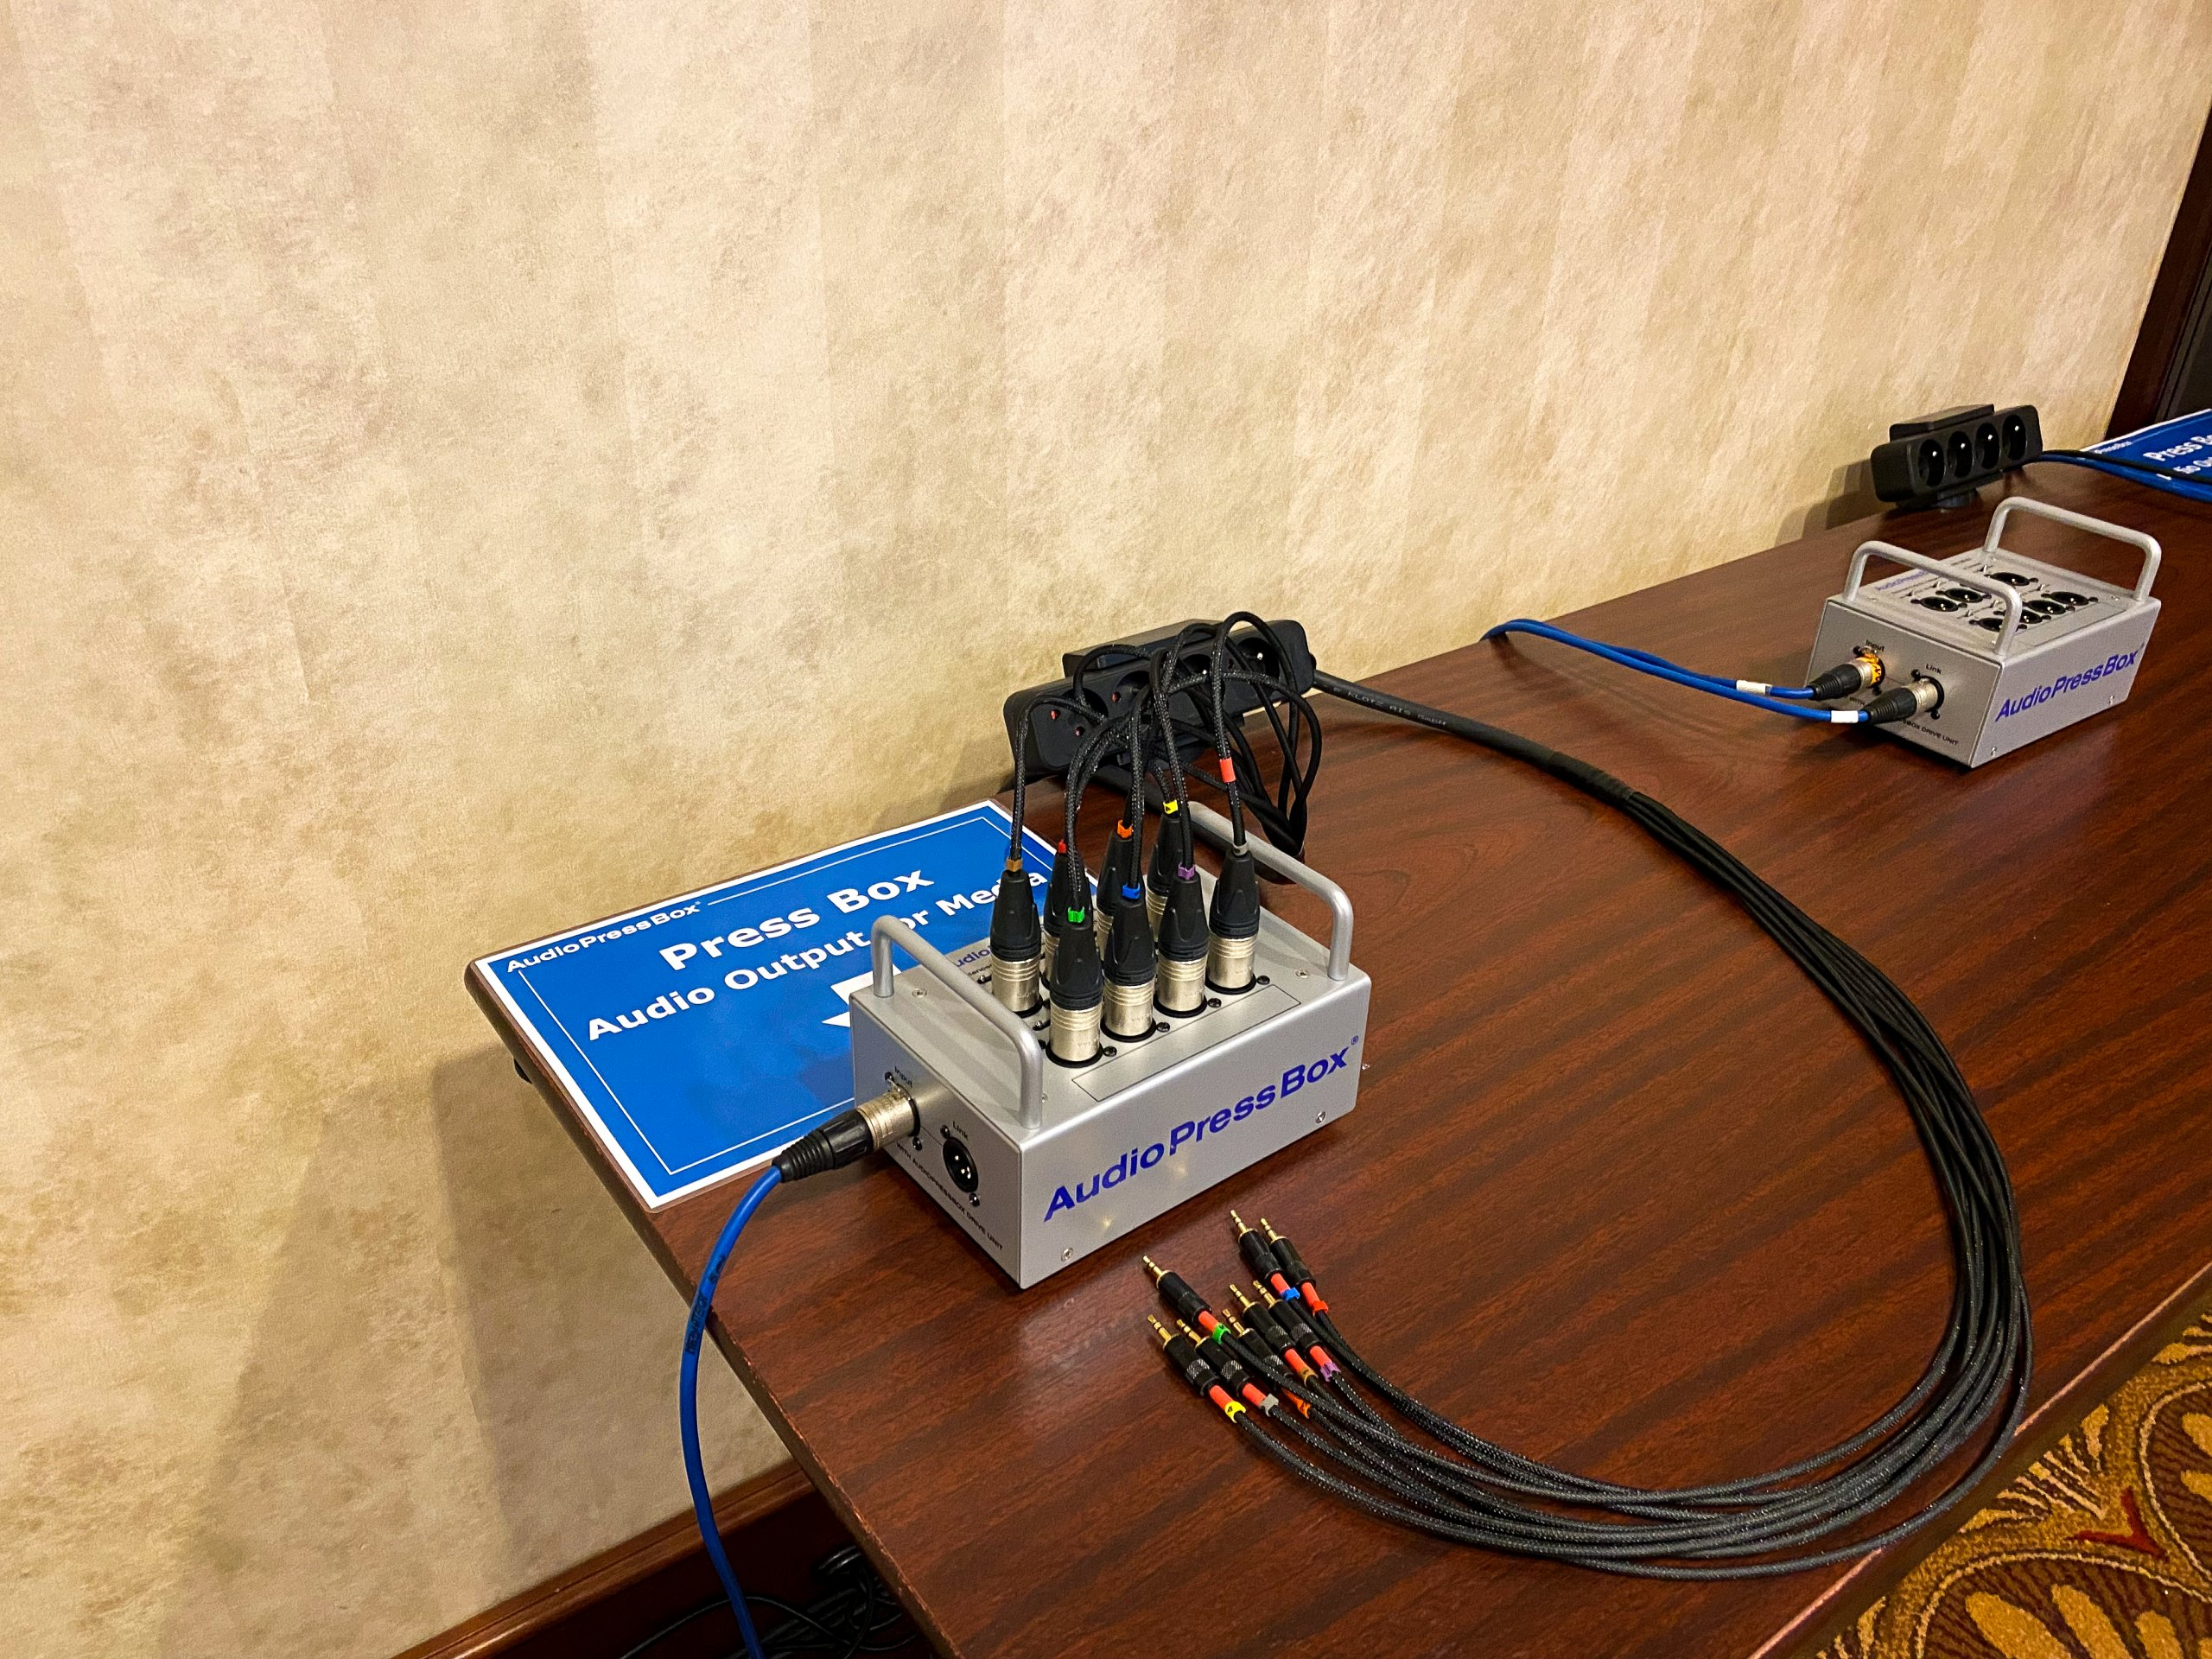 AudioPressBox-press-cenet